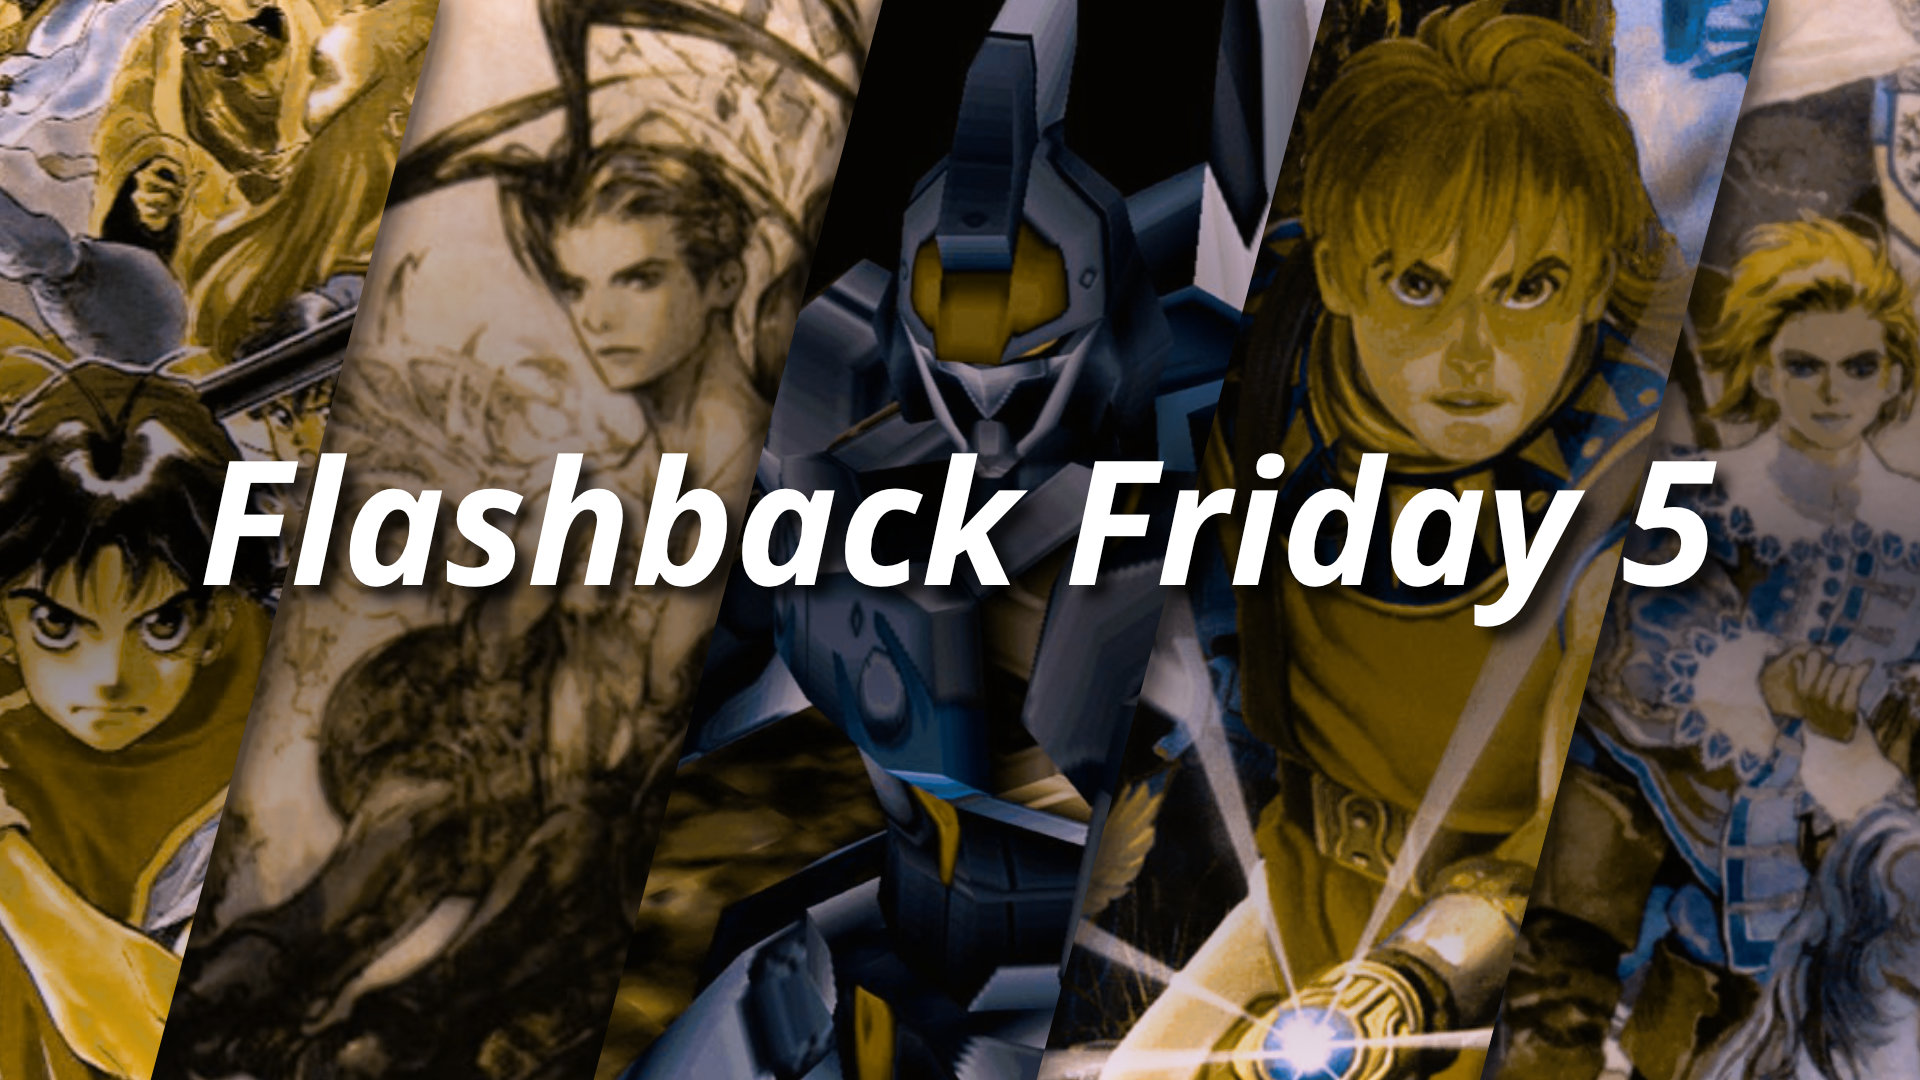 Flashback Friday 5 - PlayStation